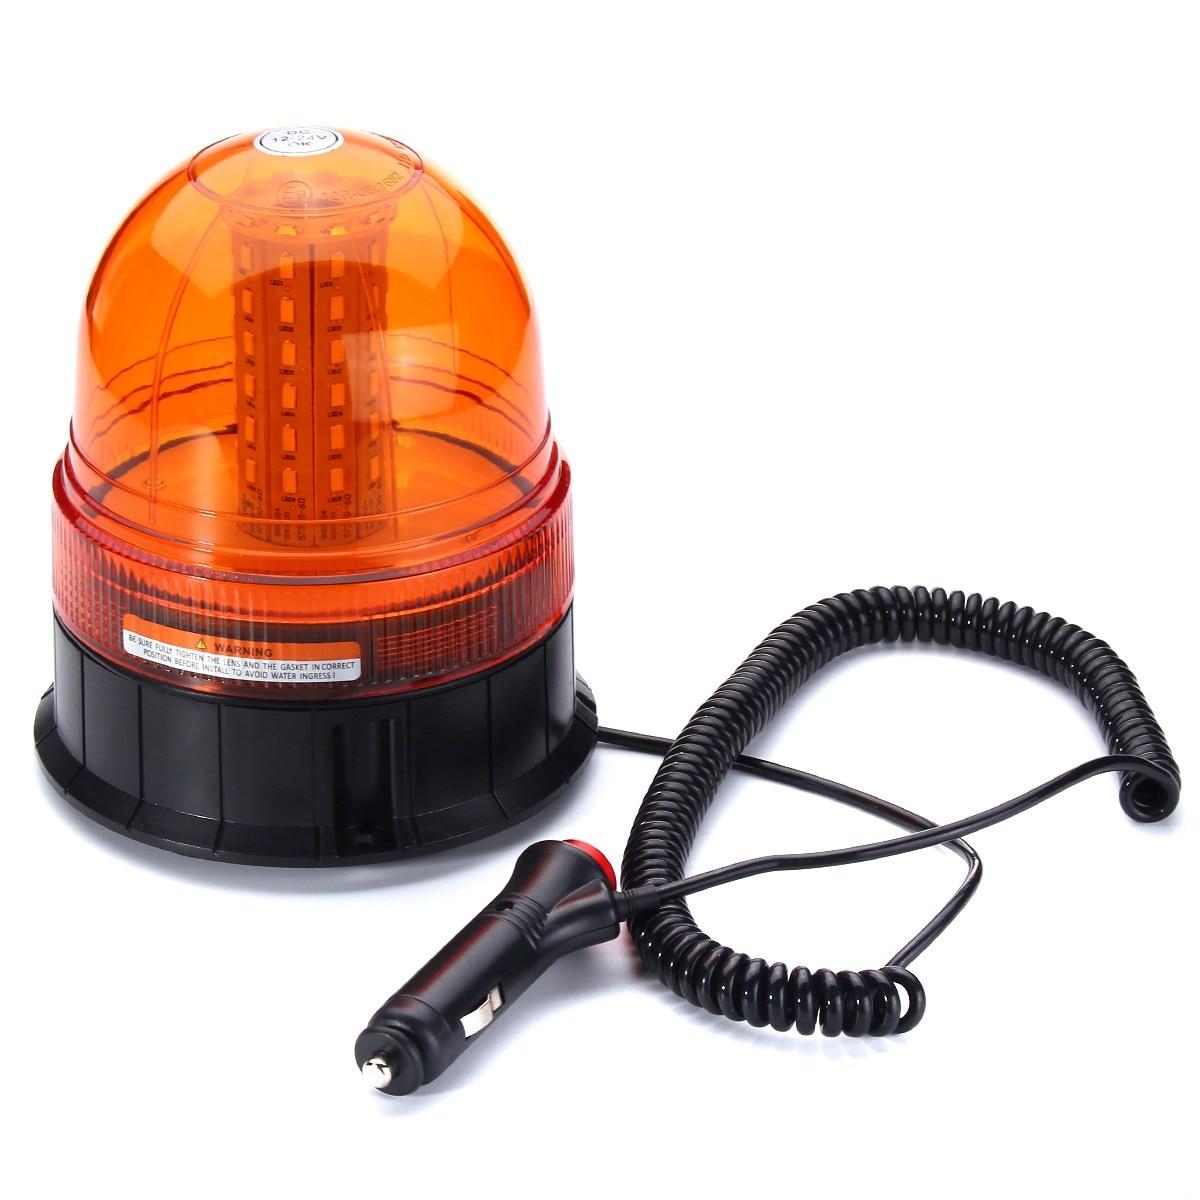 NEW 12W 5730 60 LED Emergency Vehicle Flash Stobe Rotating Beacon Warning Light Traffic Light Roadway Safety<br>